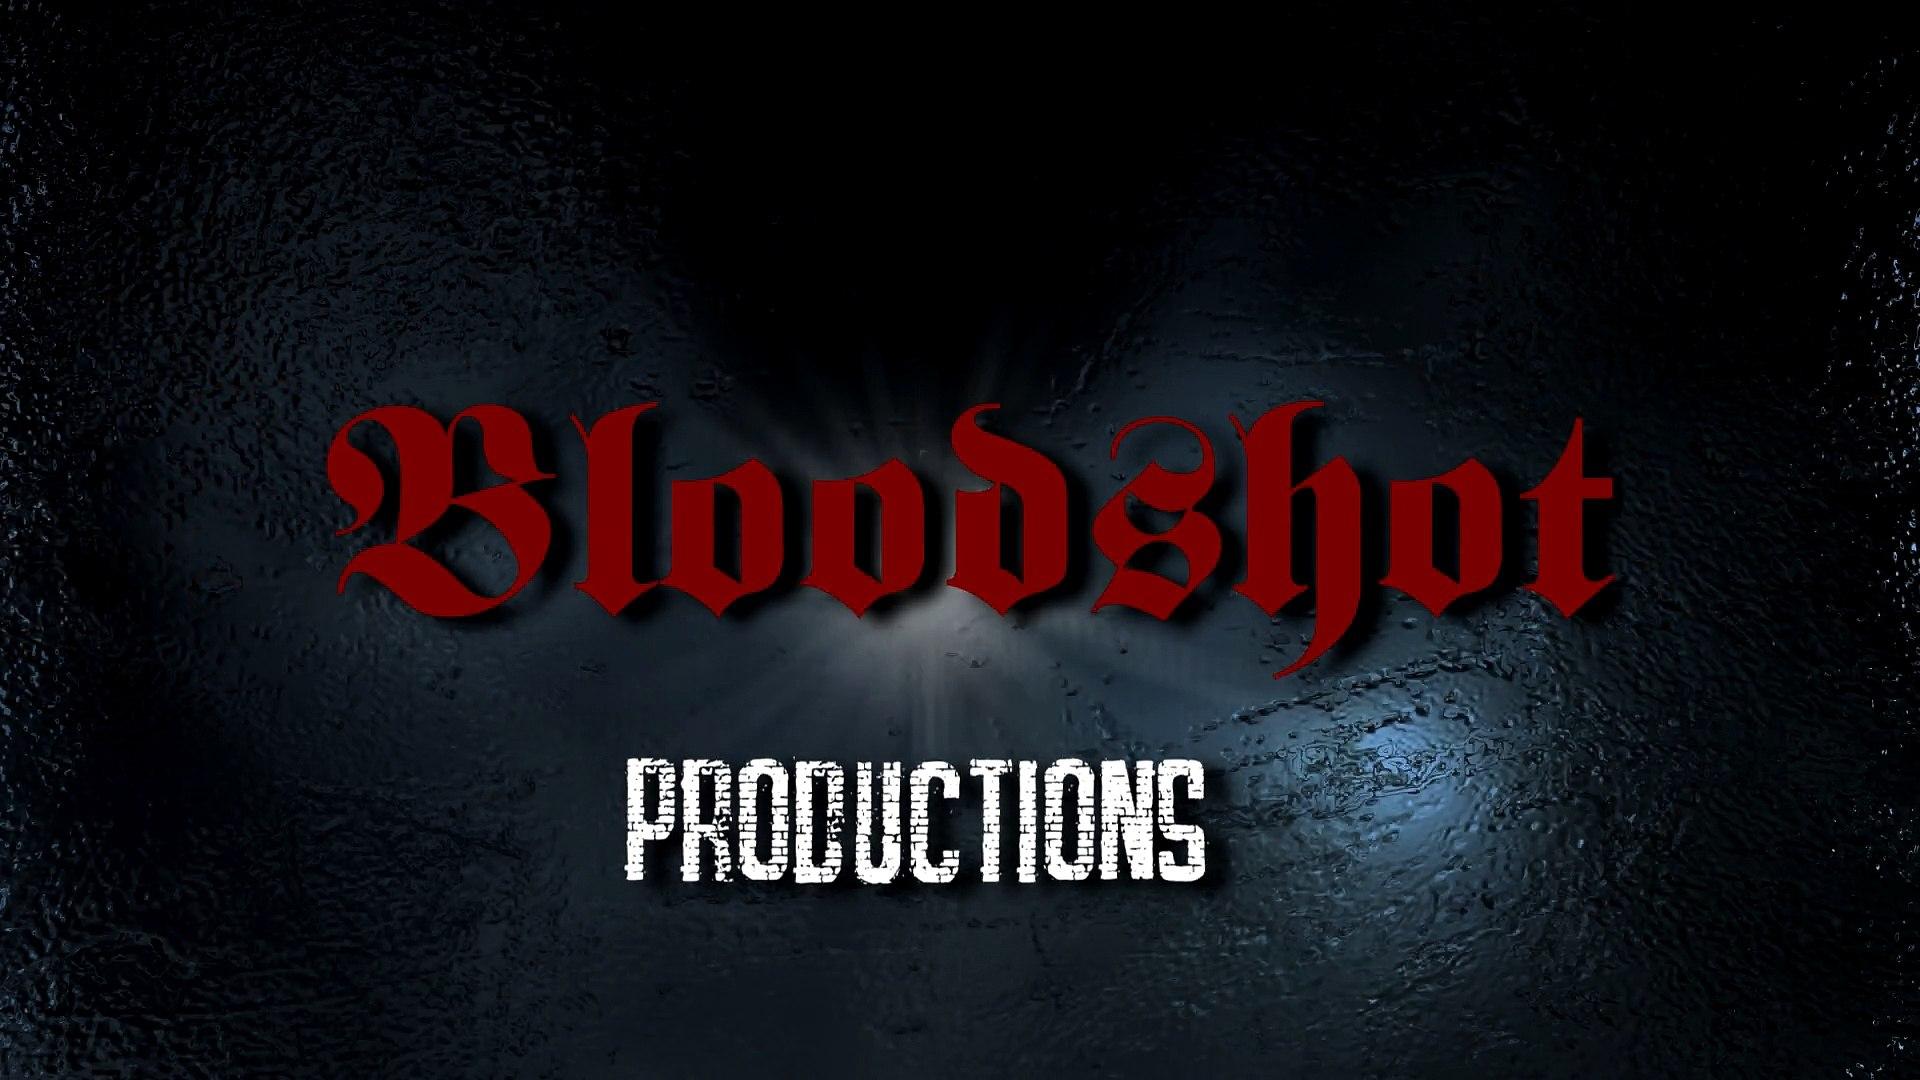 The Outlaw intro (c) 2016 bloodshot prodcutions